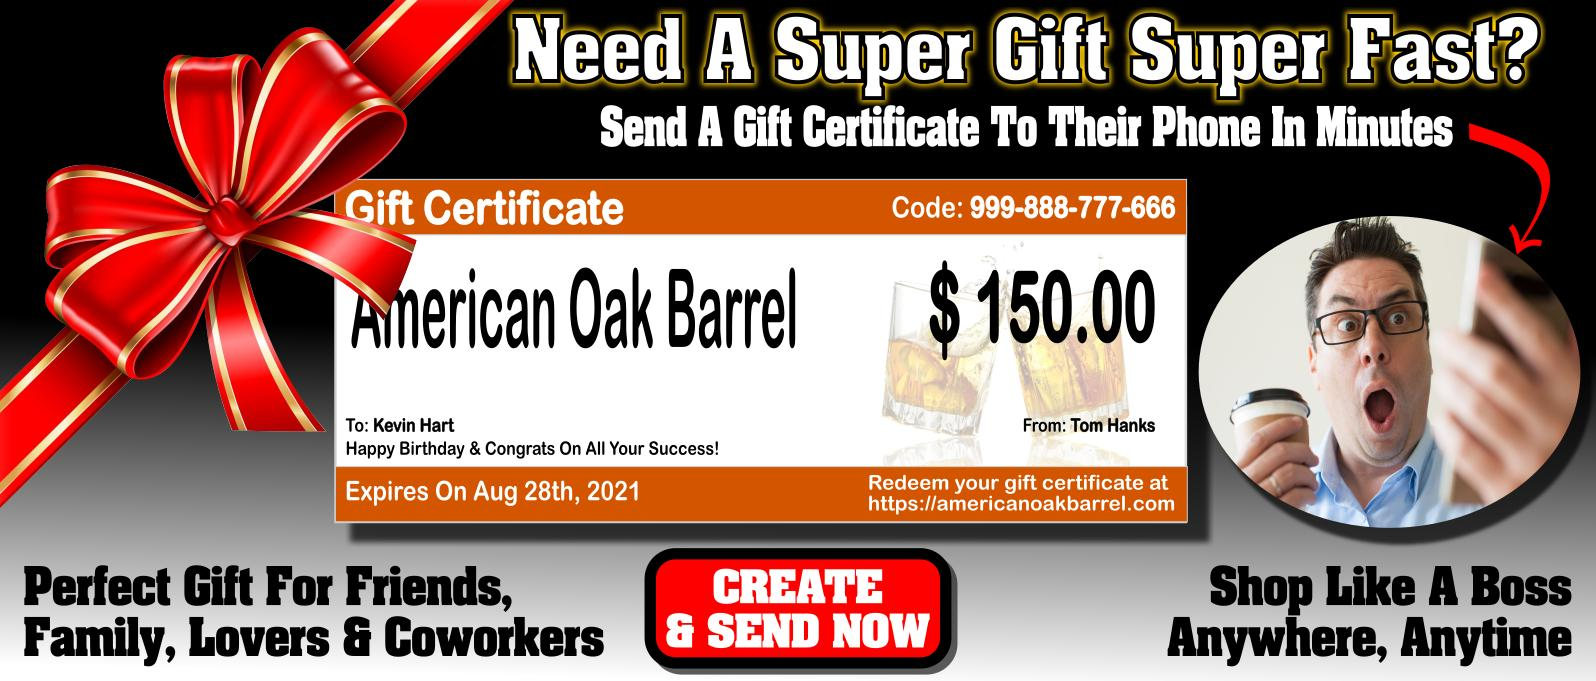 American Oak Barrel™ Gift Certificates - Spread Good Cheer